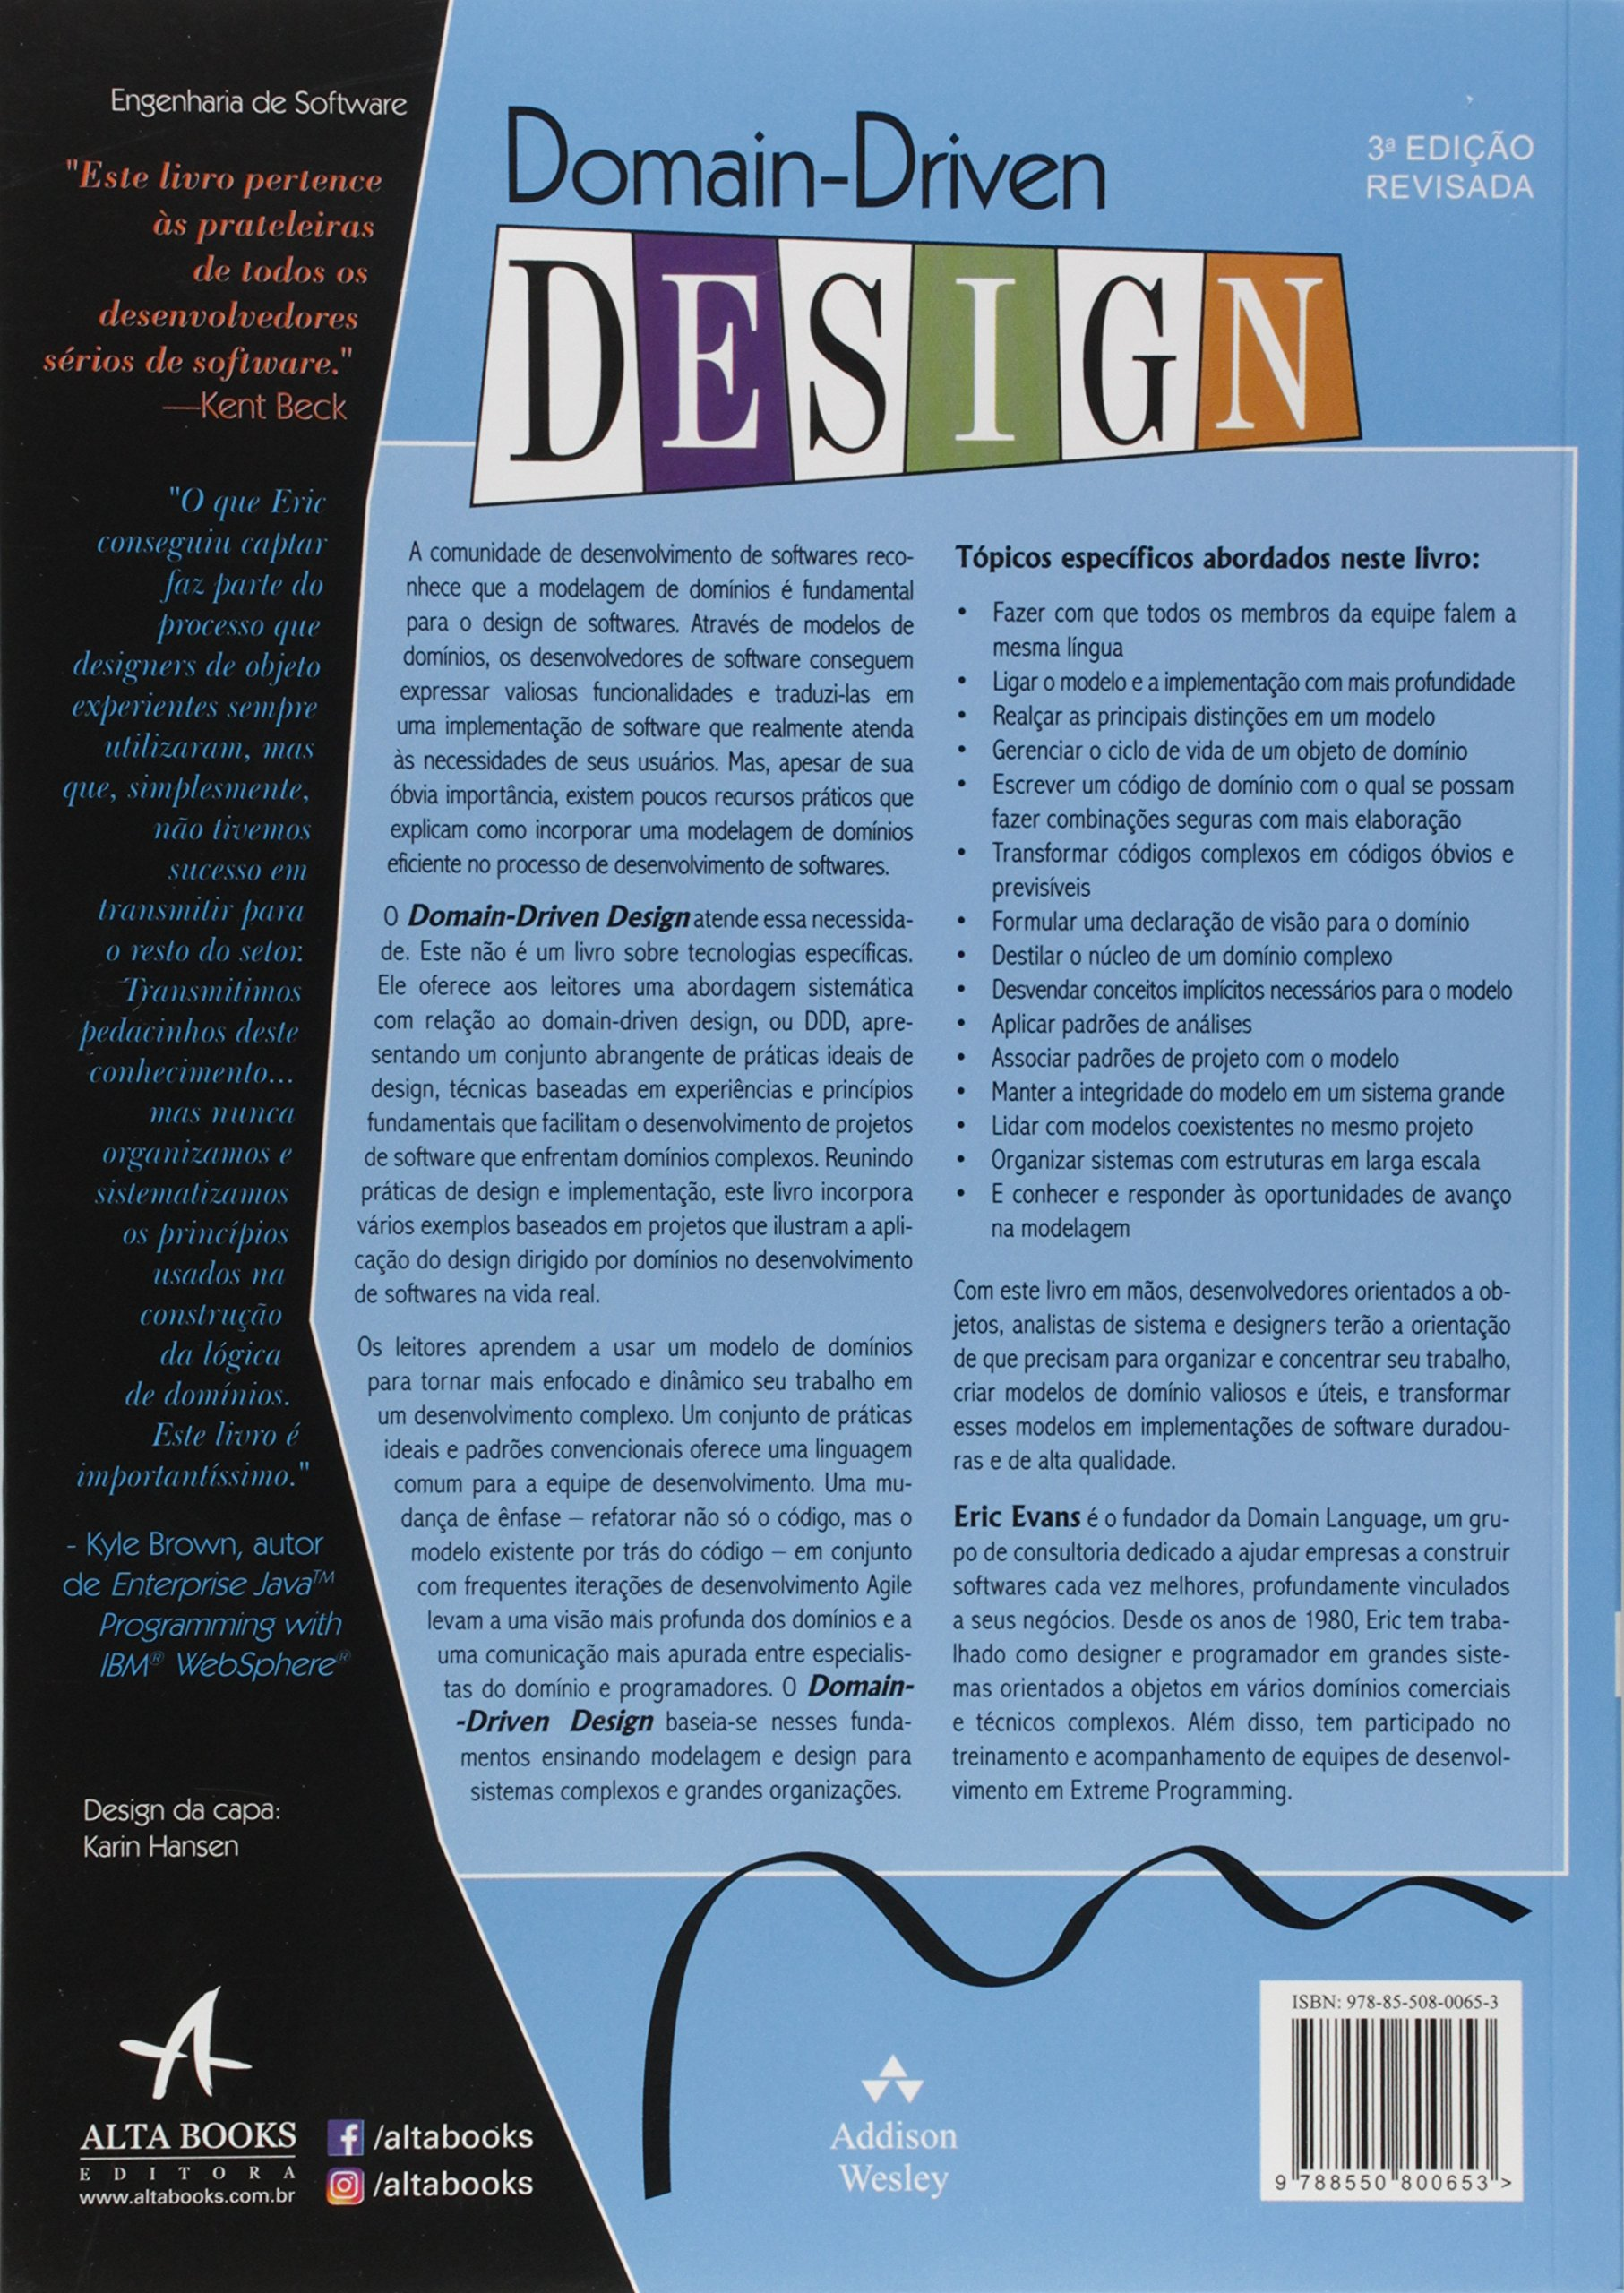 Domain Driven Design  Eric Evans, Julio Couto Novais Tiberio   Amazon.com.br  Livros 43f7ff0aa0